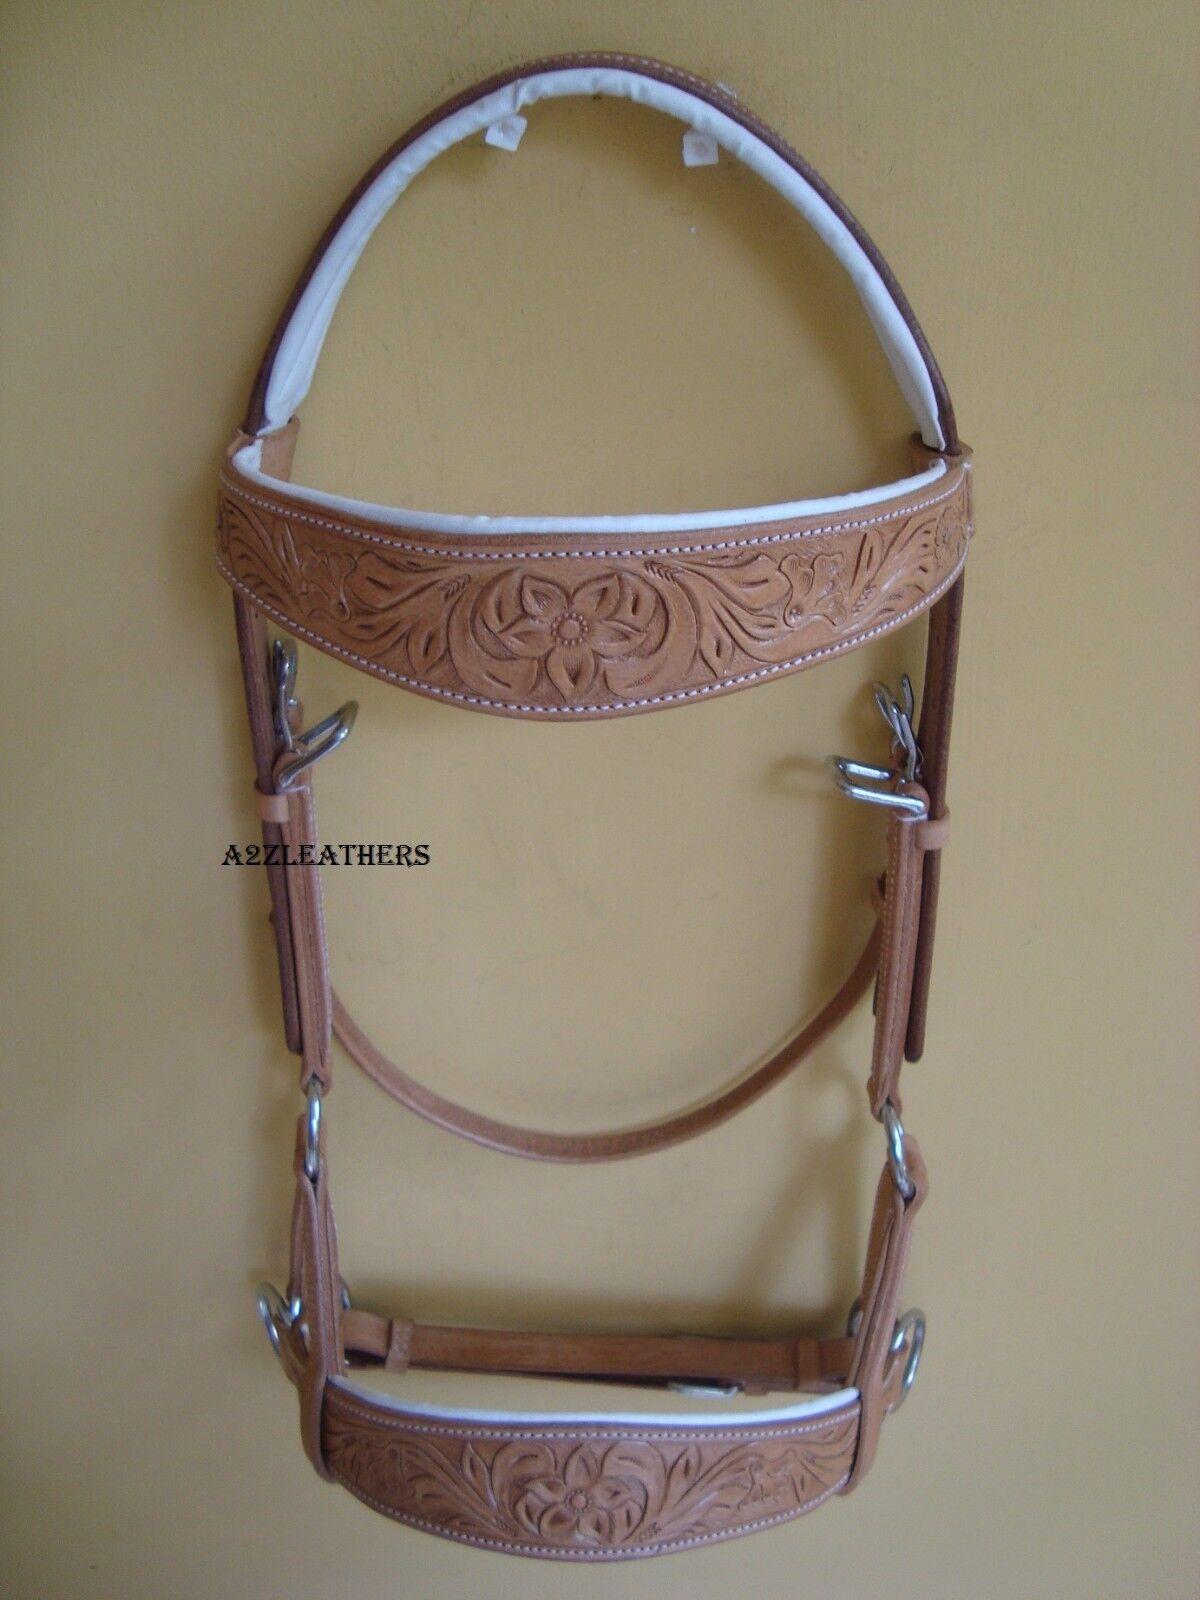 Natural sidepull bitless bridle with designer hand carving on Brow & Noseband.